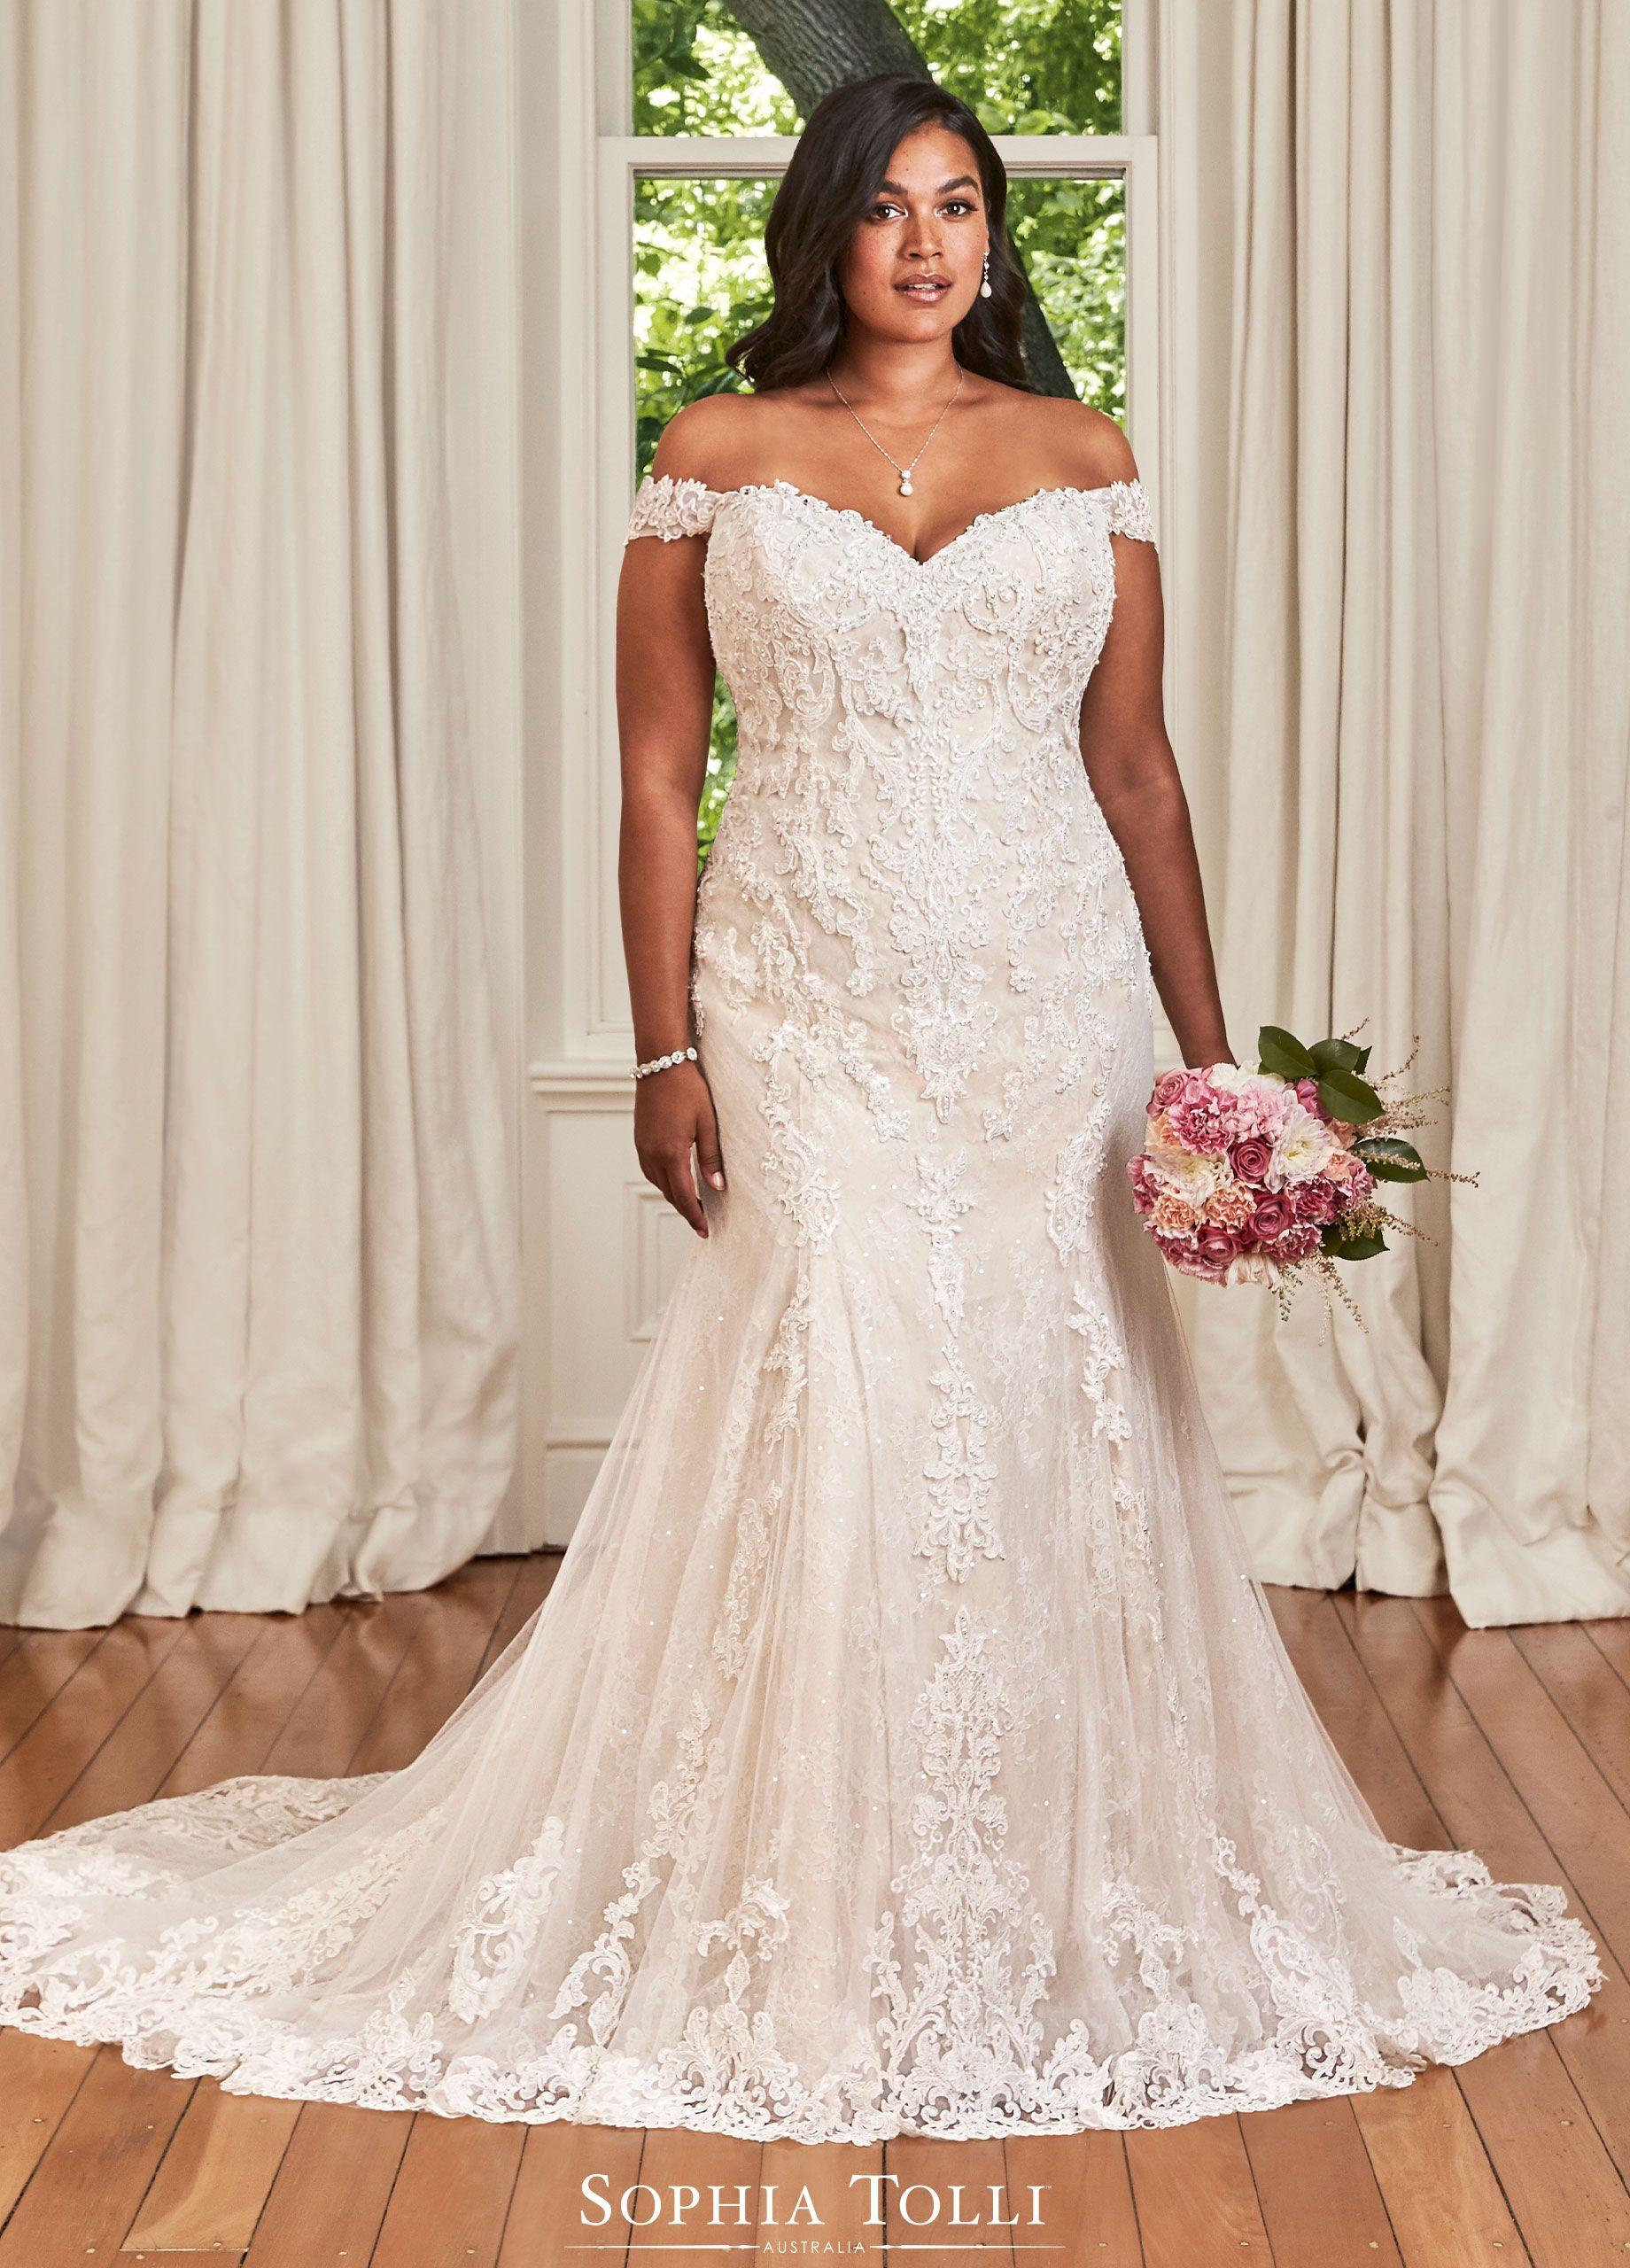 Sophia Tolli Kacey Sophia Tolli Plus Wedding Dresses Sophia Tolli Wedding Dresses Plus Size Wedding Gowns [ 2560 x 1840 Pixel ]